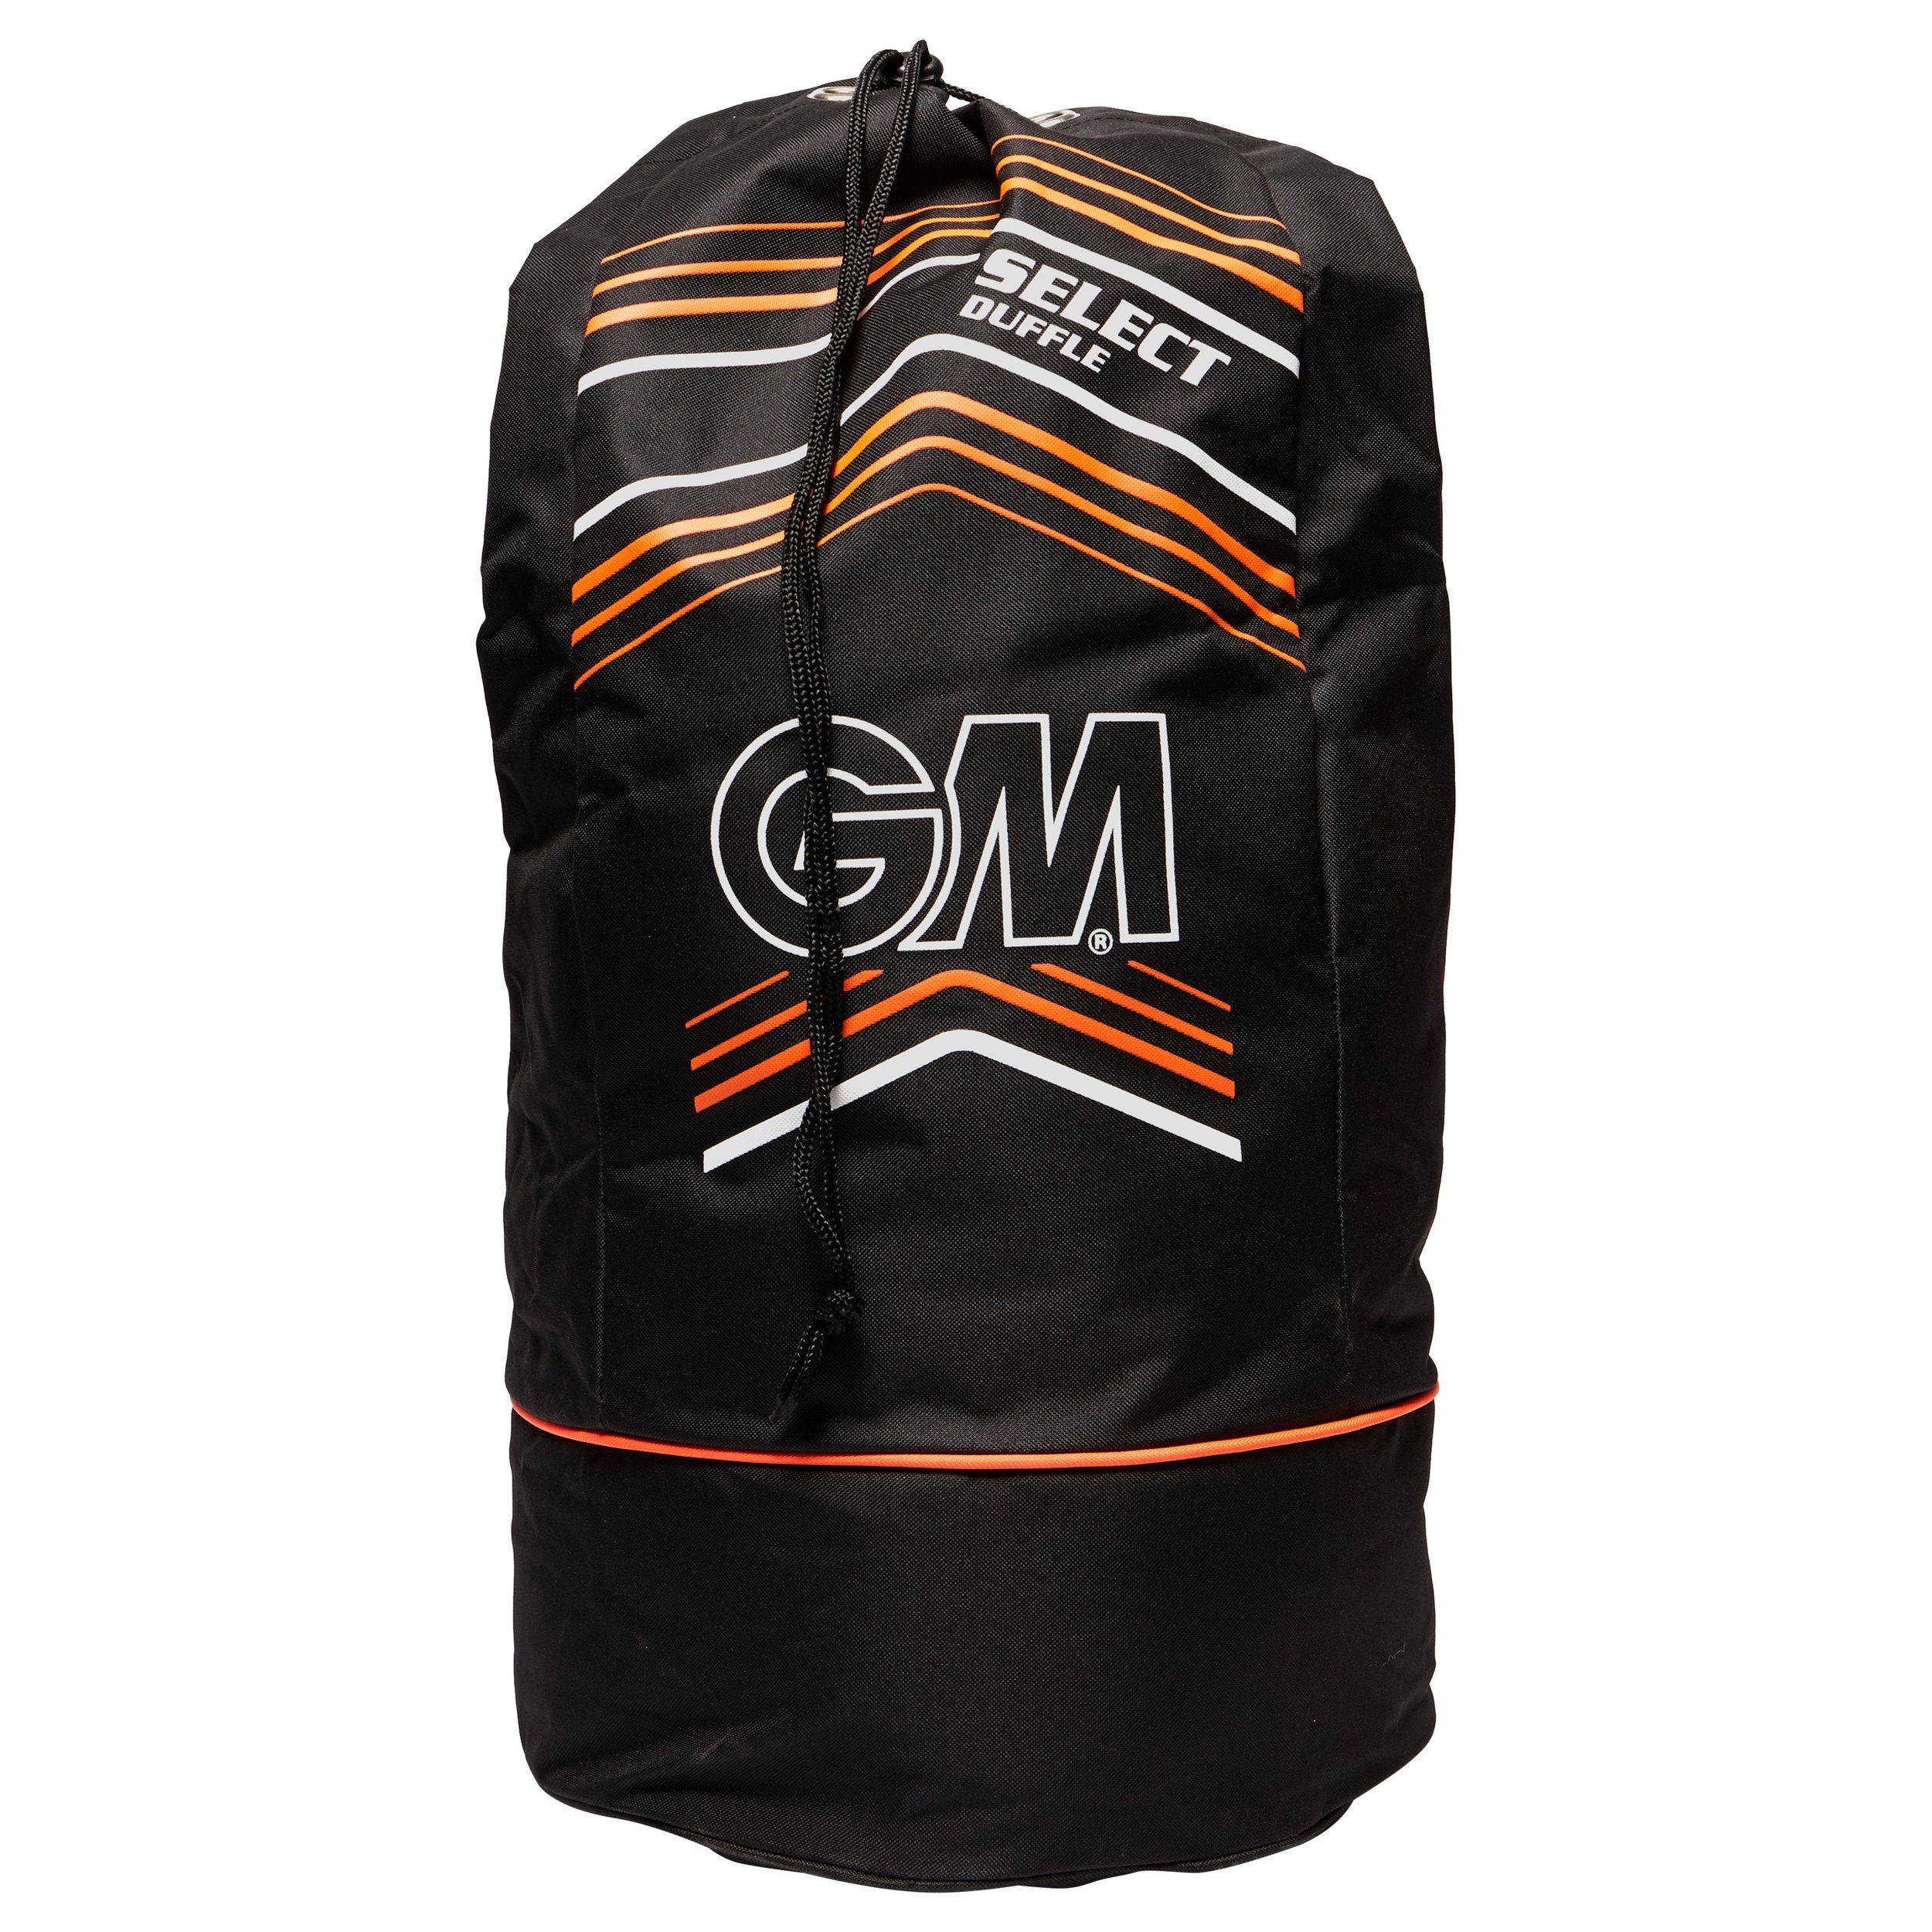 Gunn & Moore Select Duffel Cricket Bag